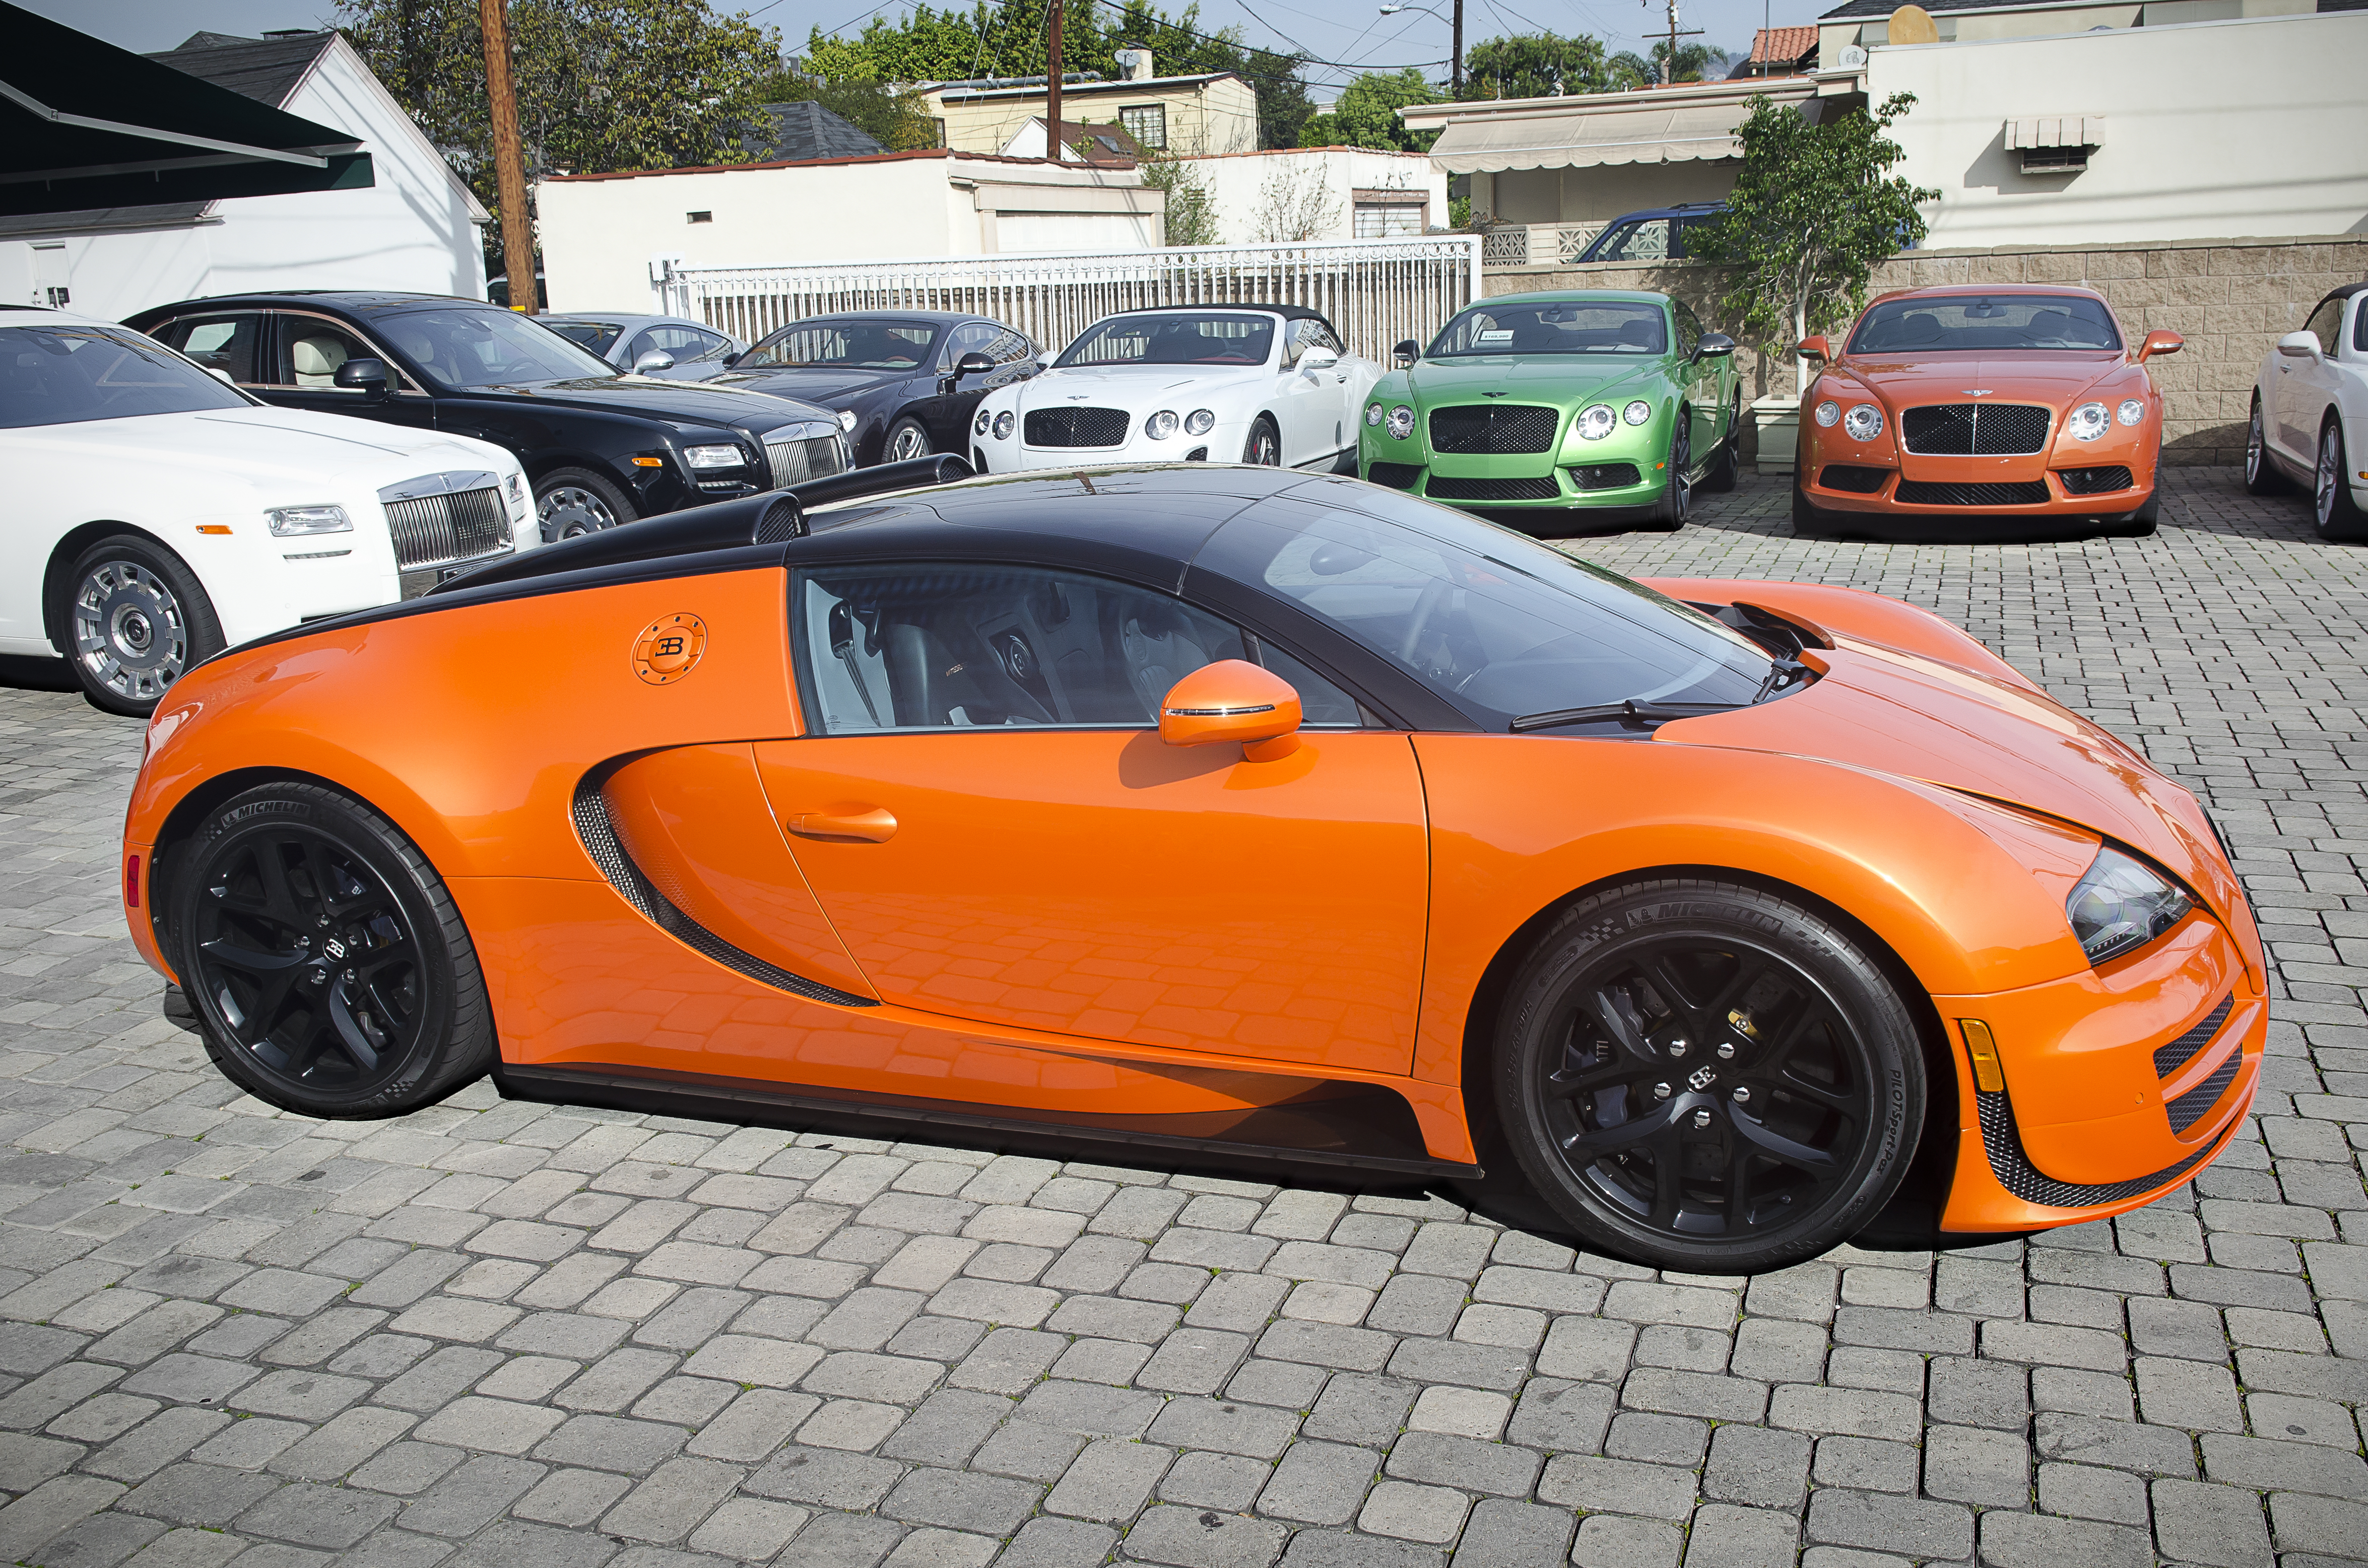 Orange_Bugatti_Veyron_Grand_Sport_Vitesse_%2812570420484%29 Extraordinary Bugatti Veyron Grand Sport Vitesse Cars Trend